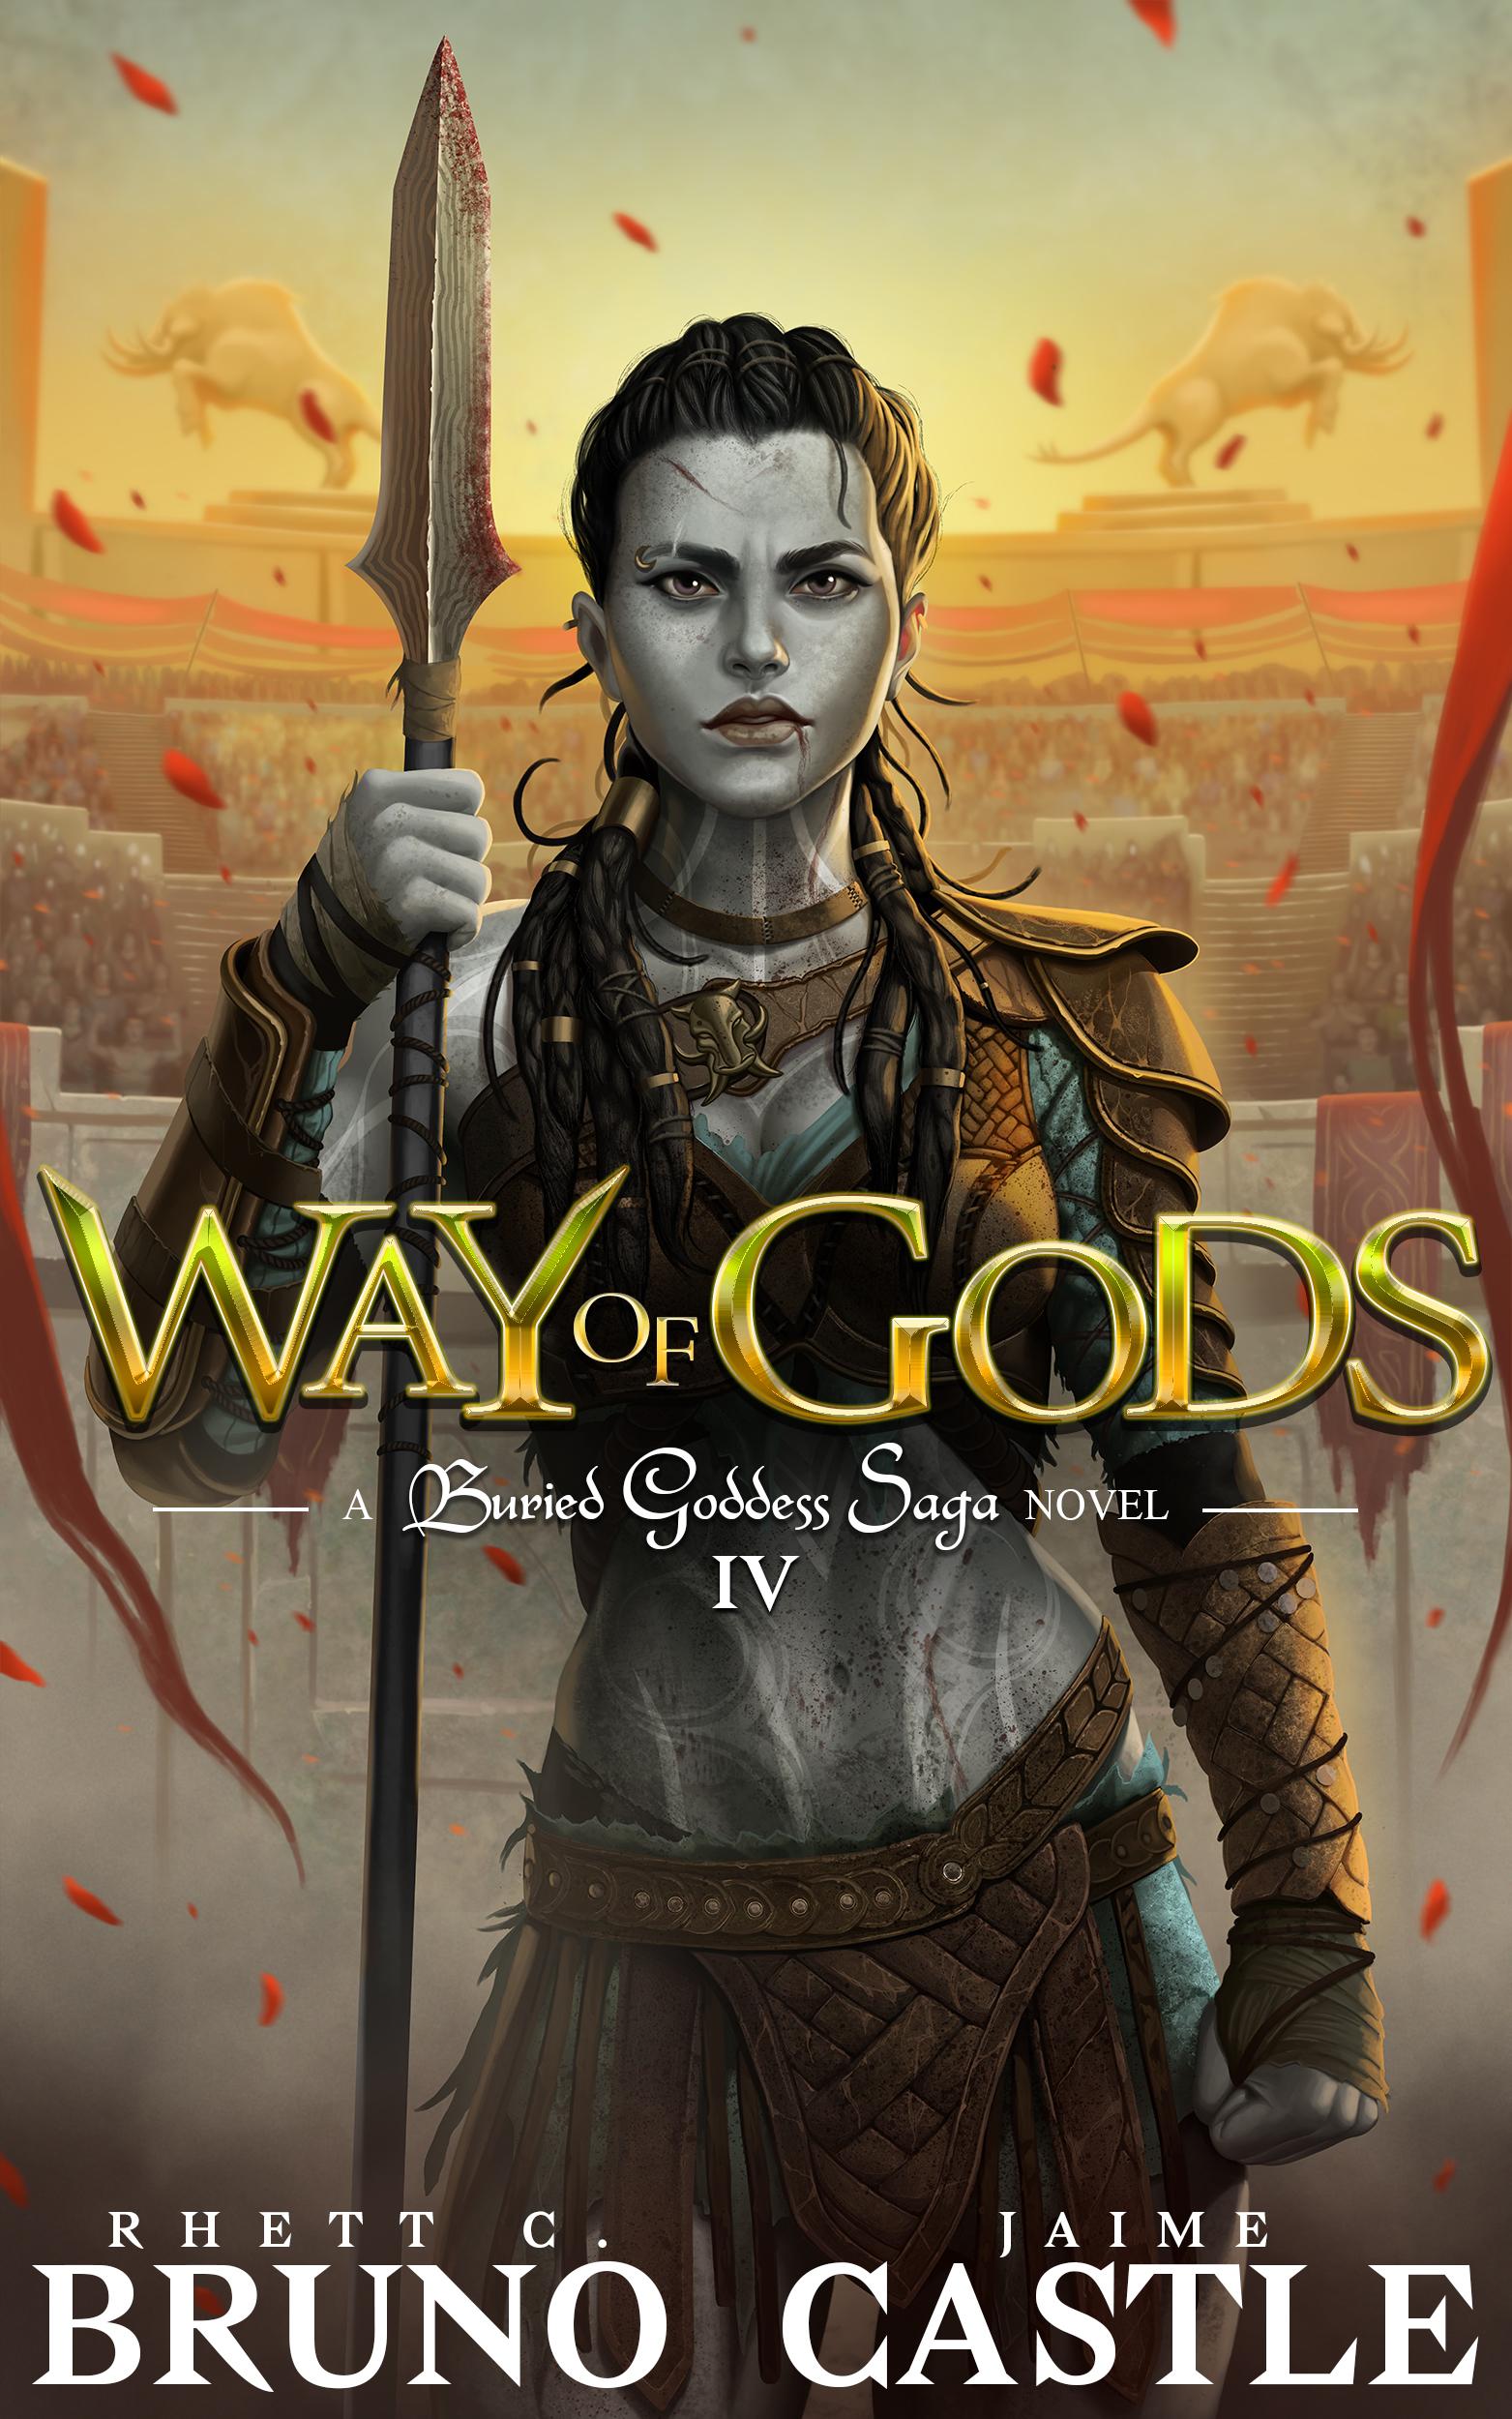 Way of Gods   Buried Goddess Saga Book 4  Rhett C. Bruno & Jaime Castle